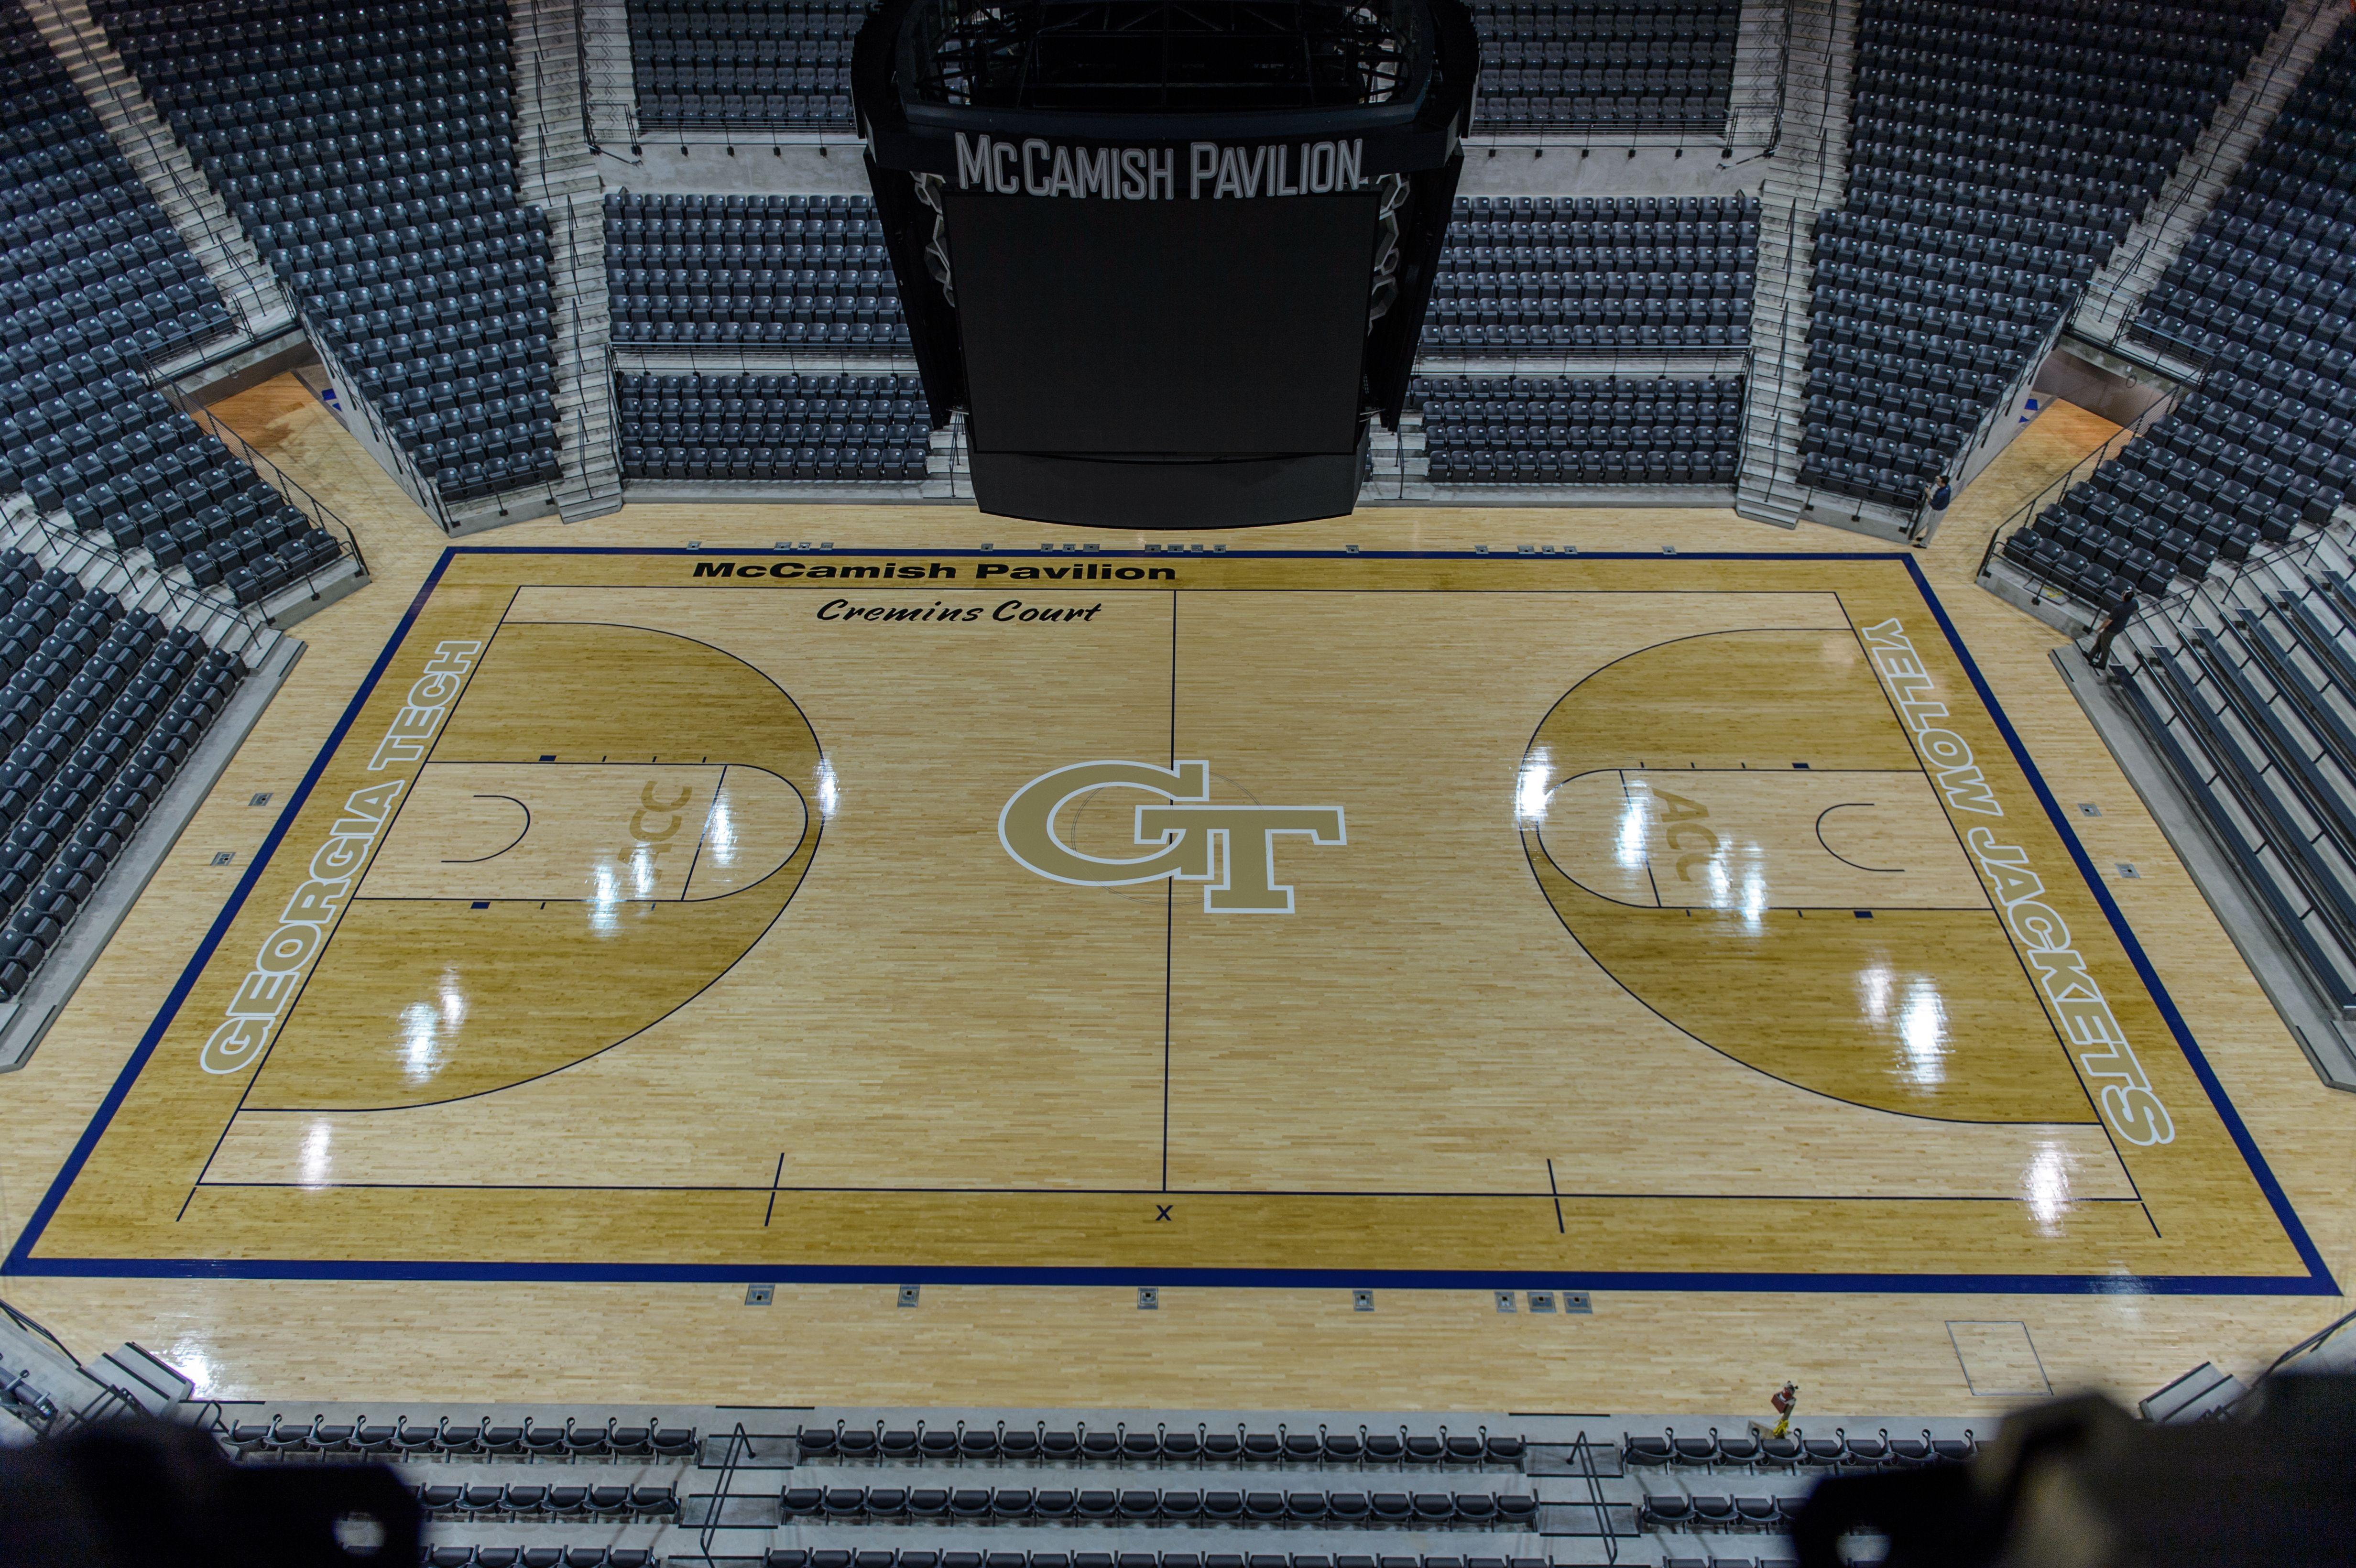 Georgia tech 39 s mccamish pavilion floor i 39 m a ramblin for Georgia floor